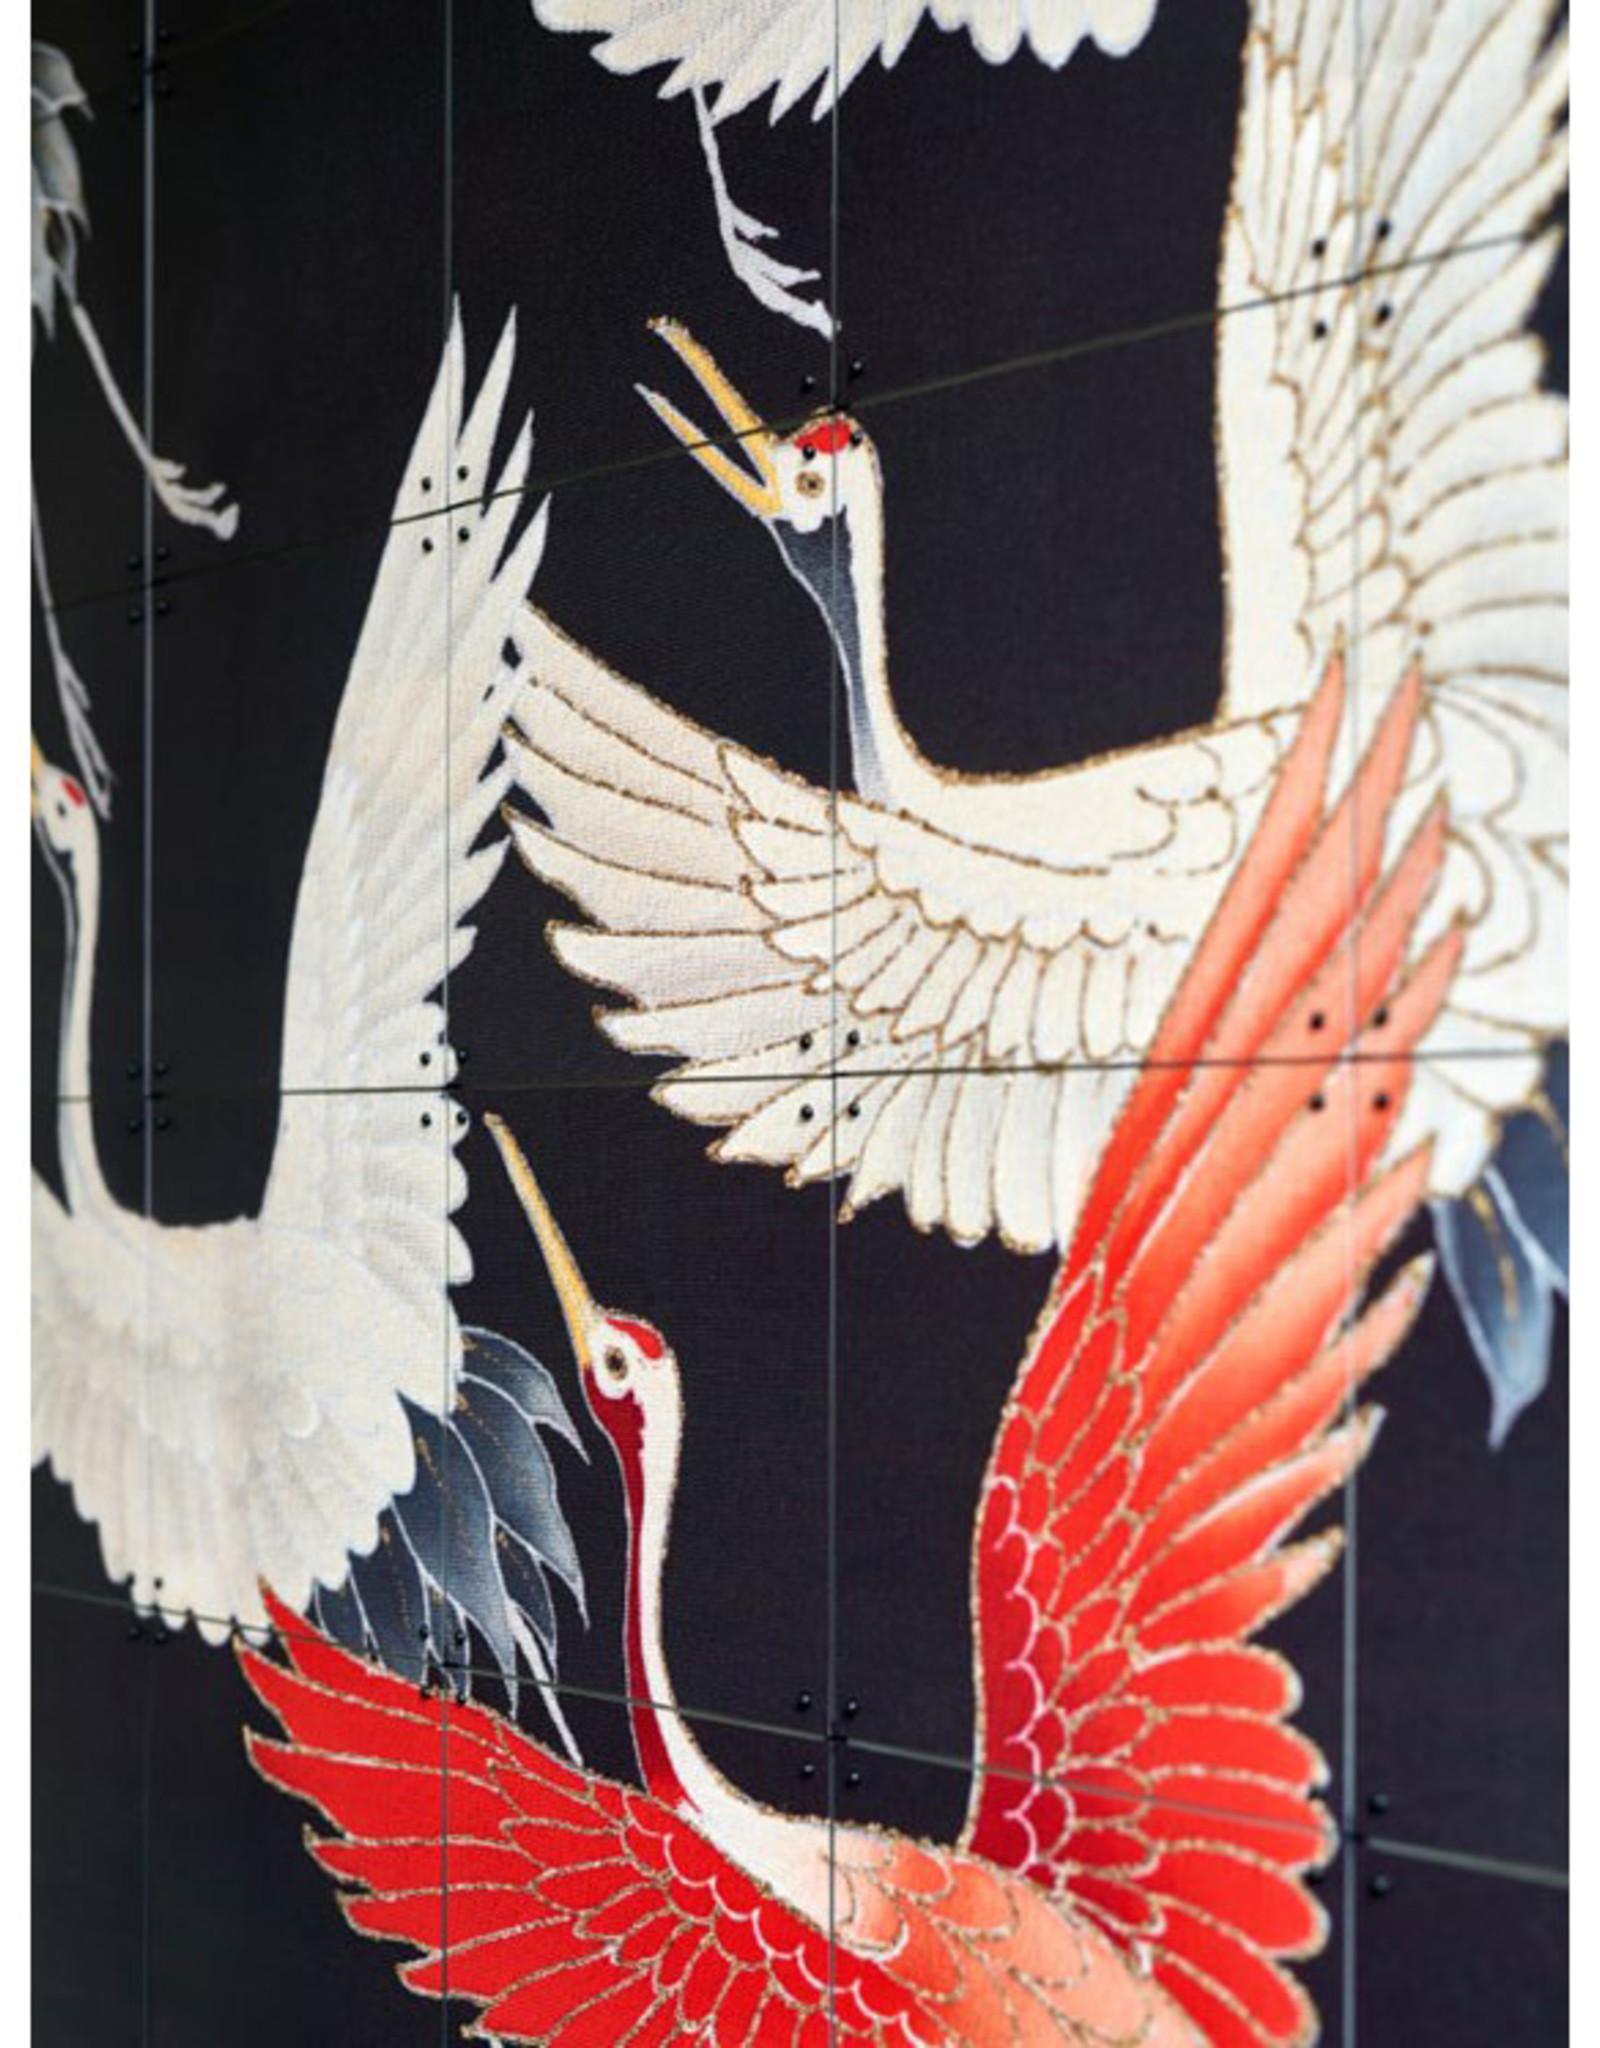 IXXI Kimono with Cranes (Double-Sided) - 120cm x 160cm